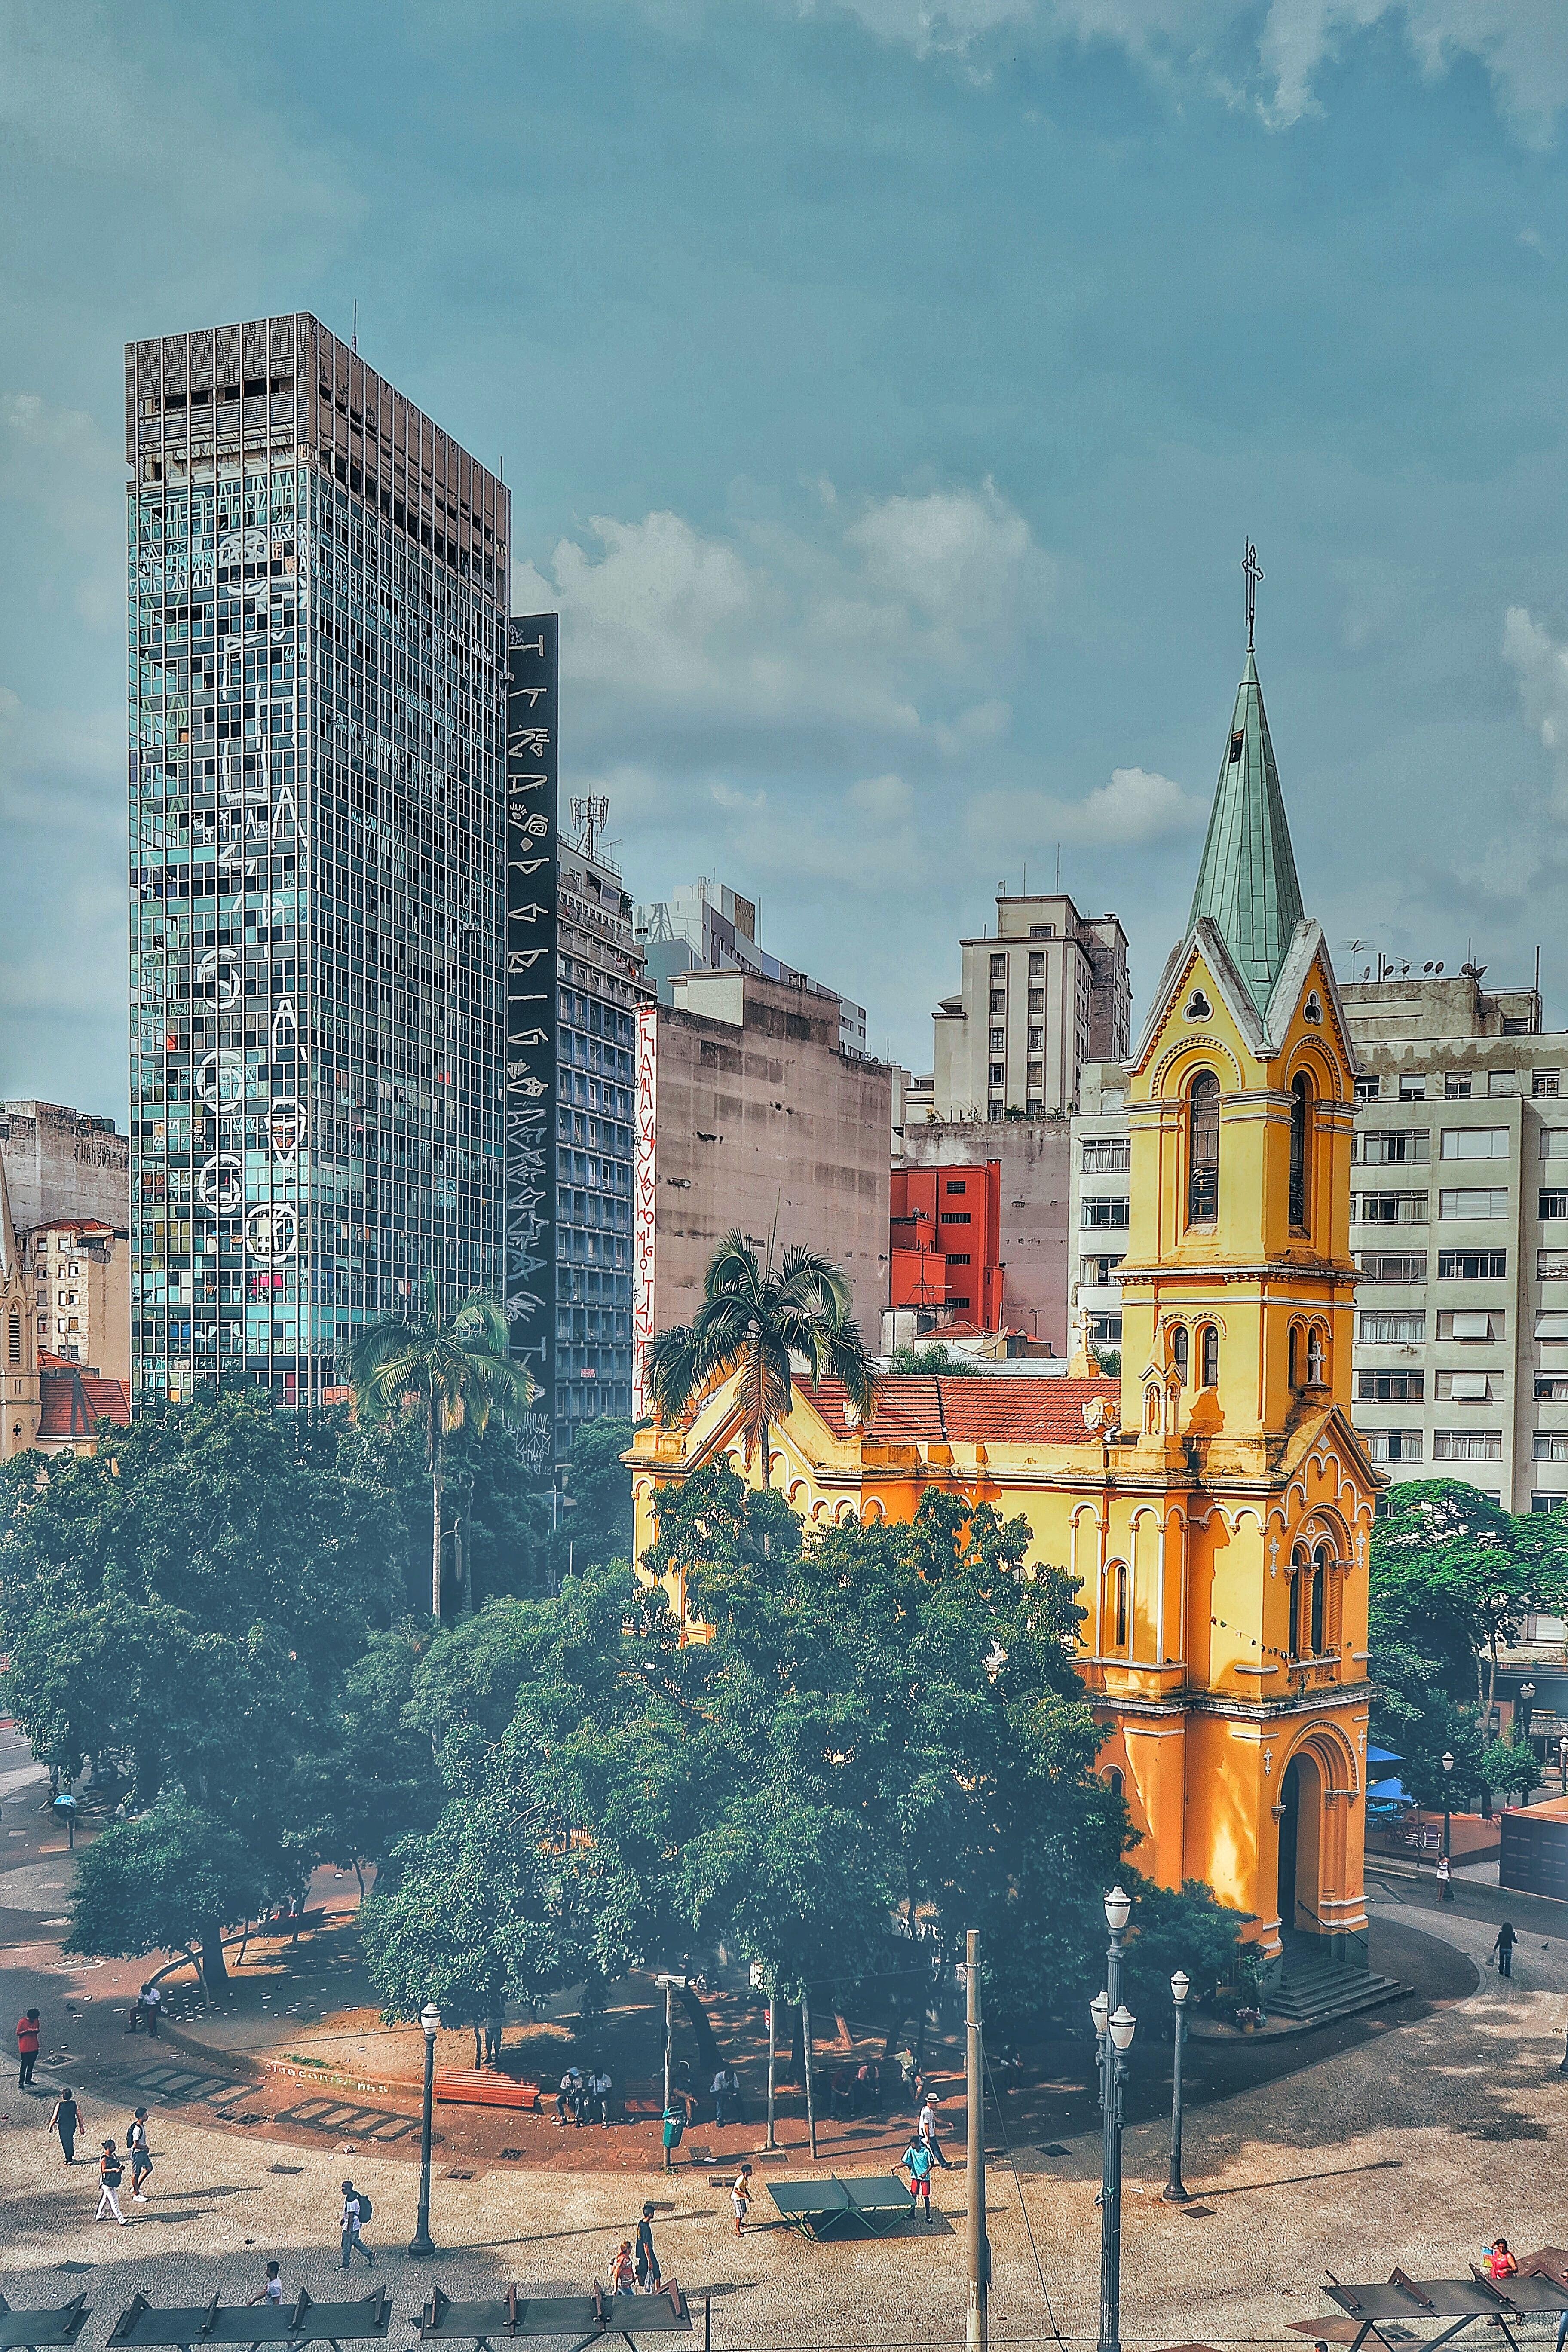 Largo do Paissandú, São Paulo, Brazil, World Missionary Press, Unsplash